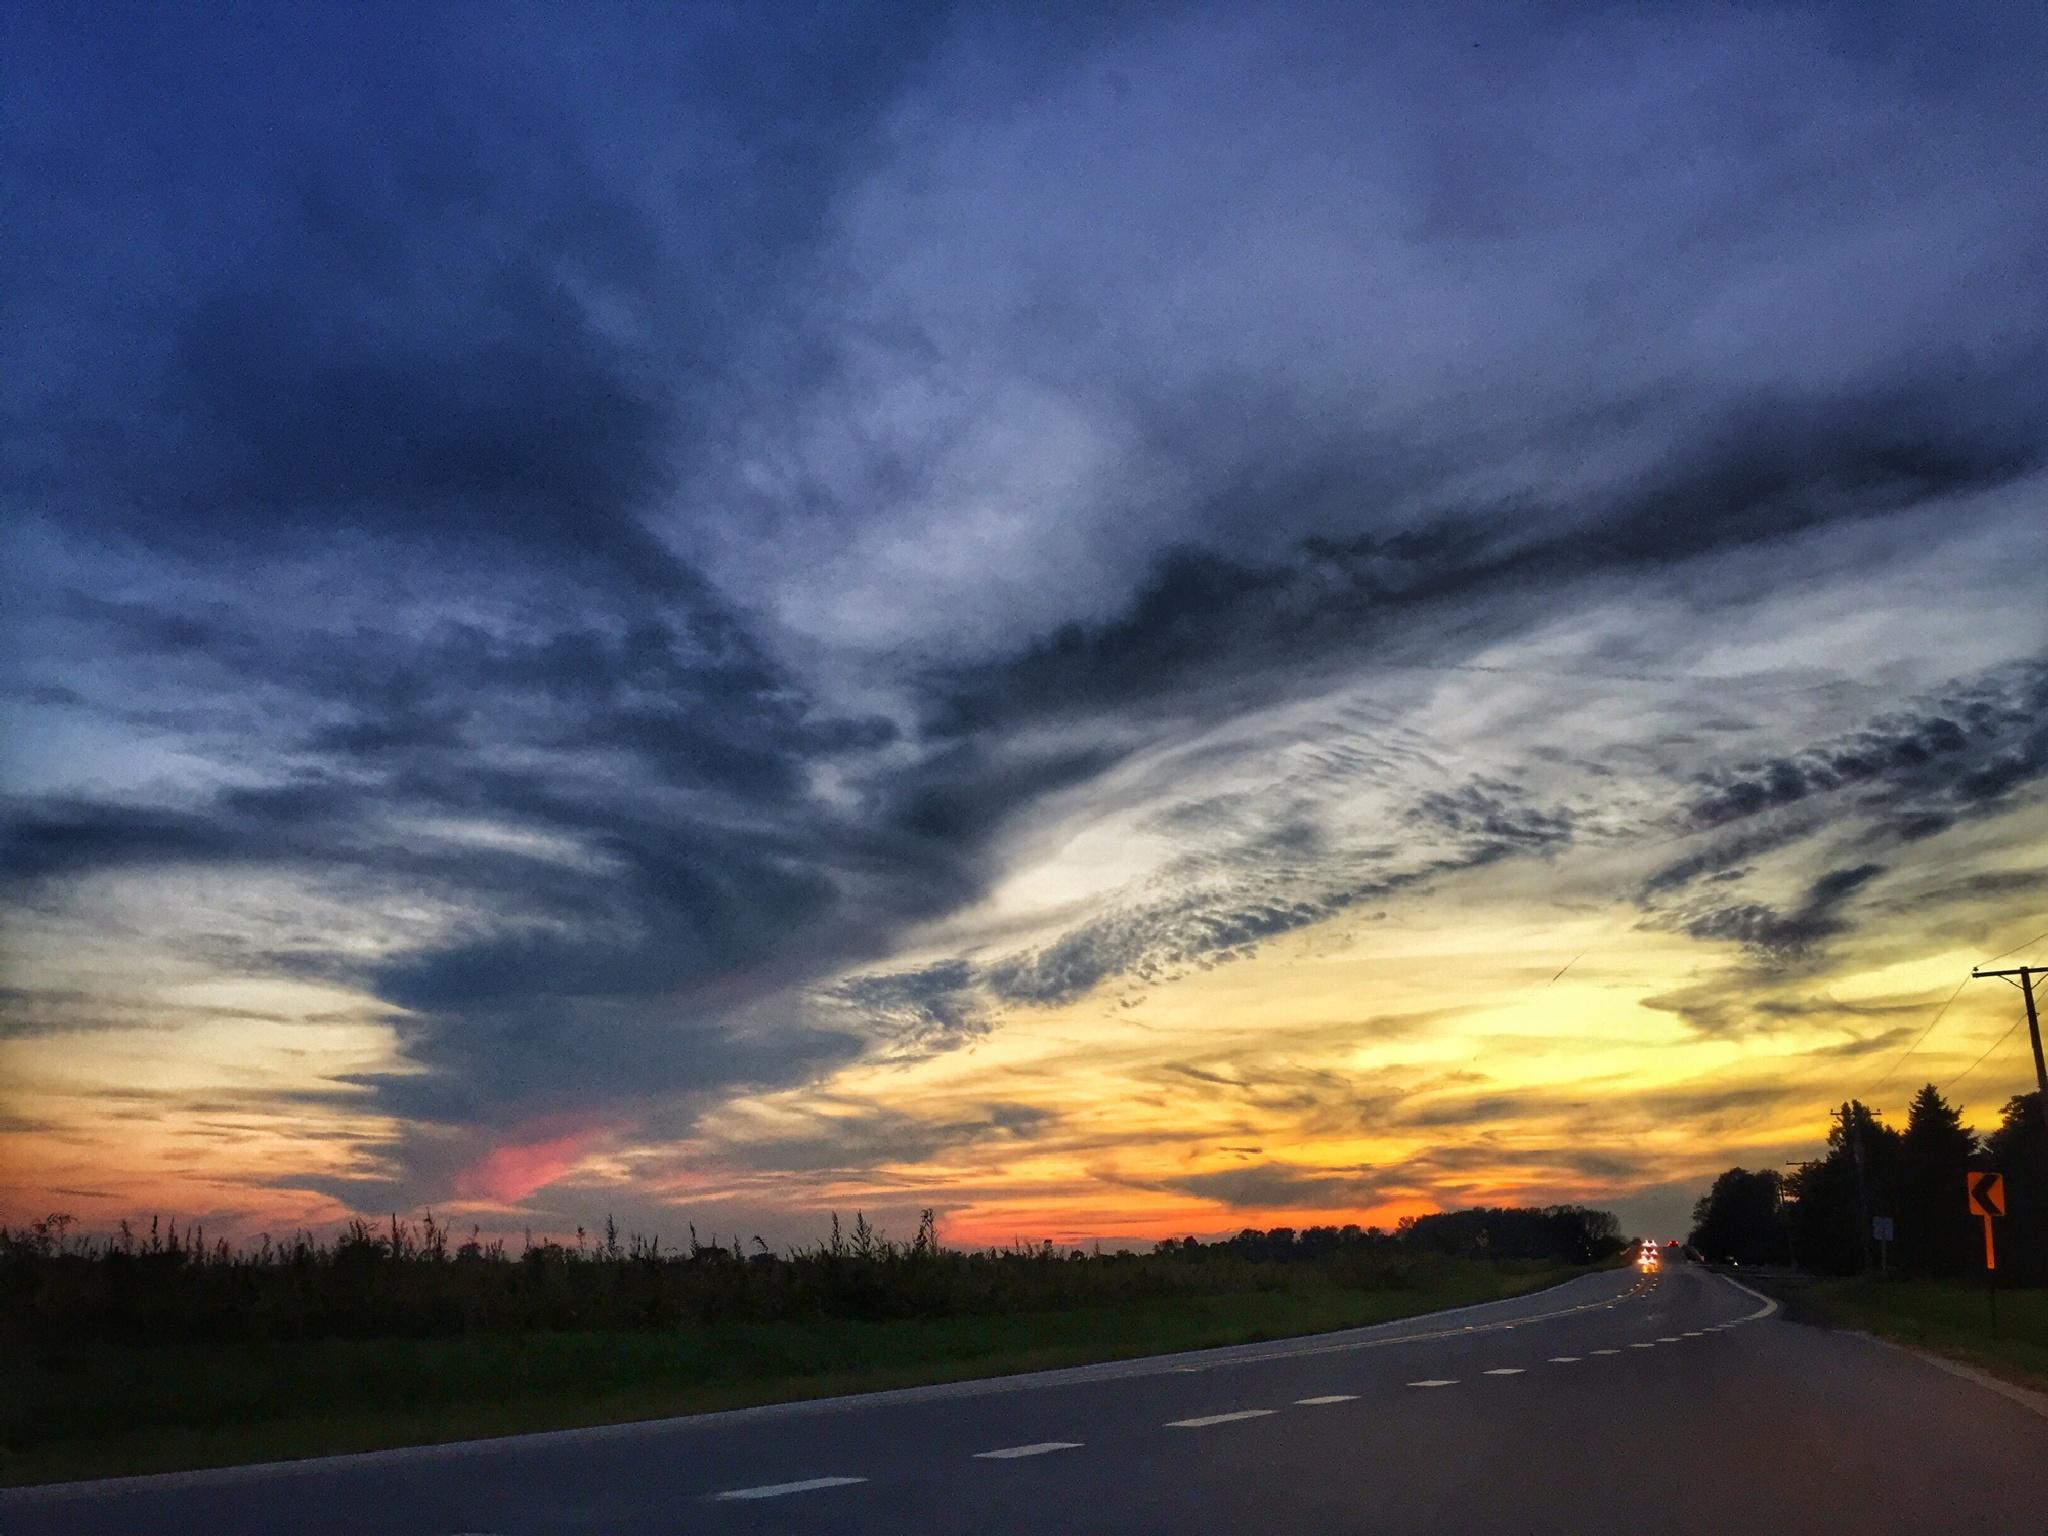 Sunset Sky by rickferris